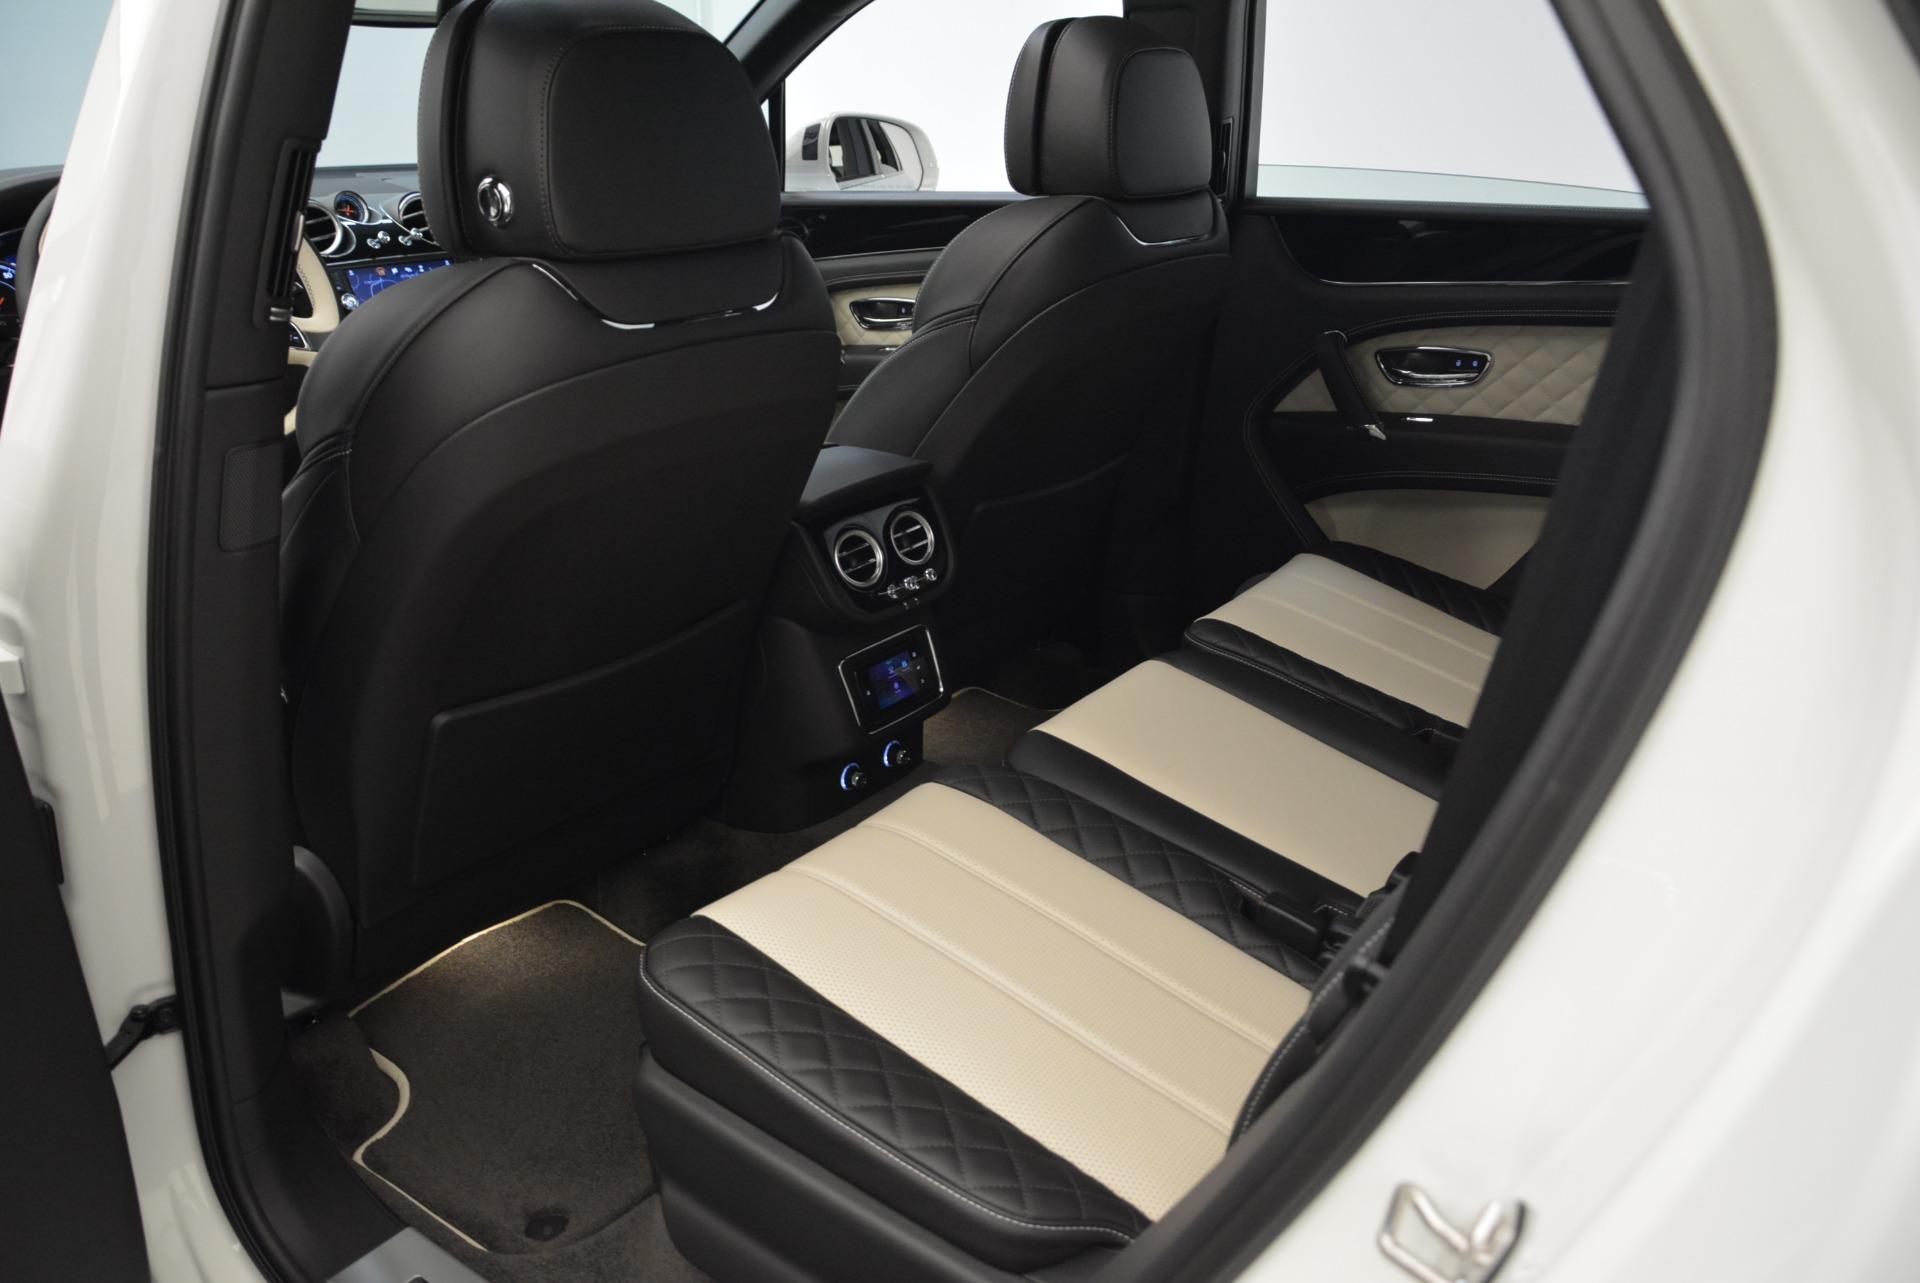 Used 2018 Bentley Bentayga Activity Edition For Sale In Westport, CT 1922_p21